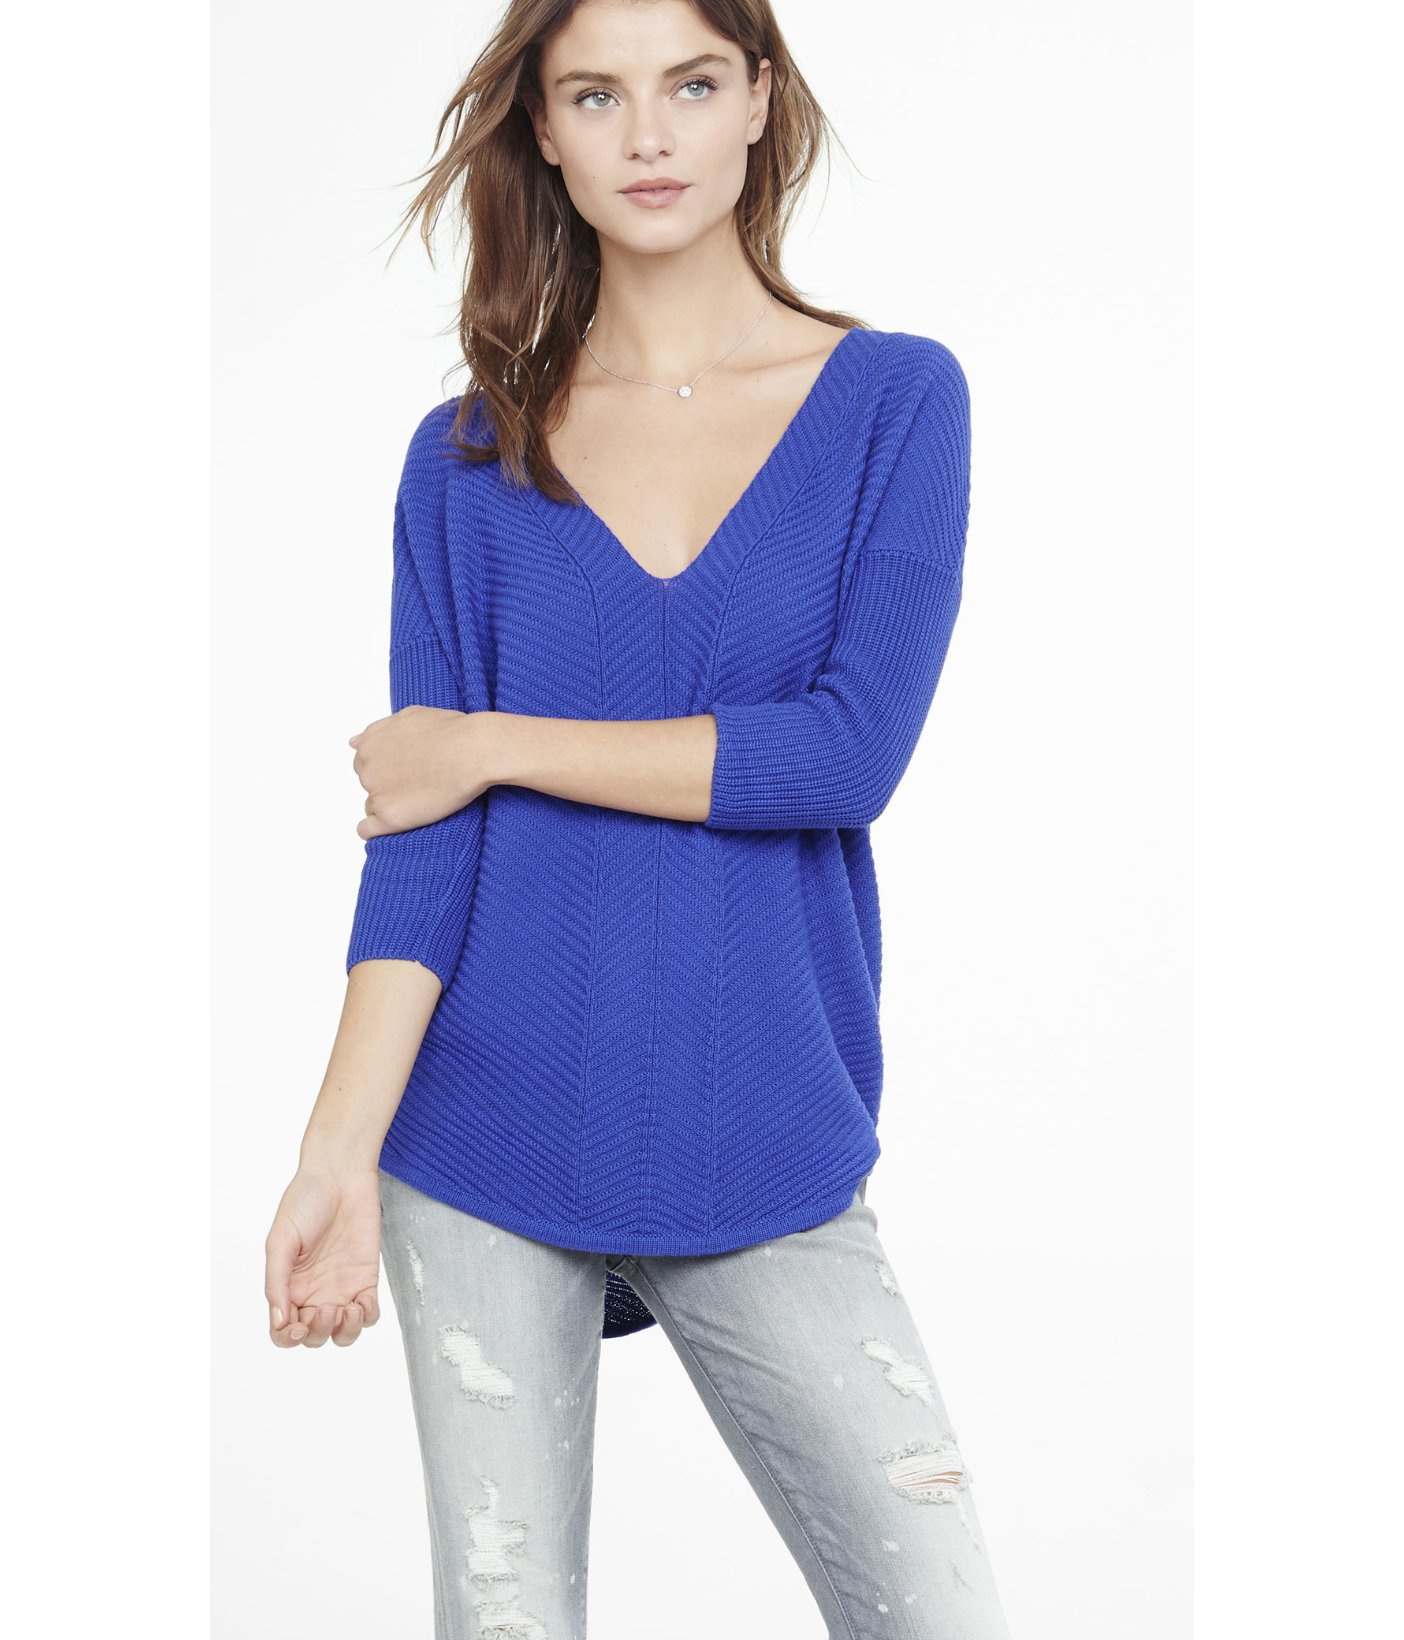 Express Engineered Rib London Tunic Sweater in Blue | Lyst